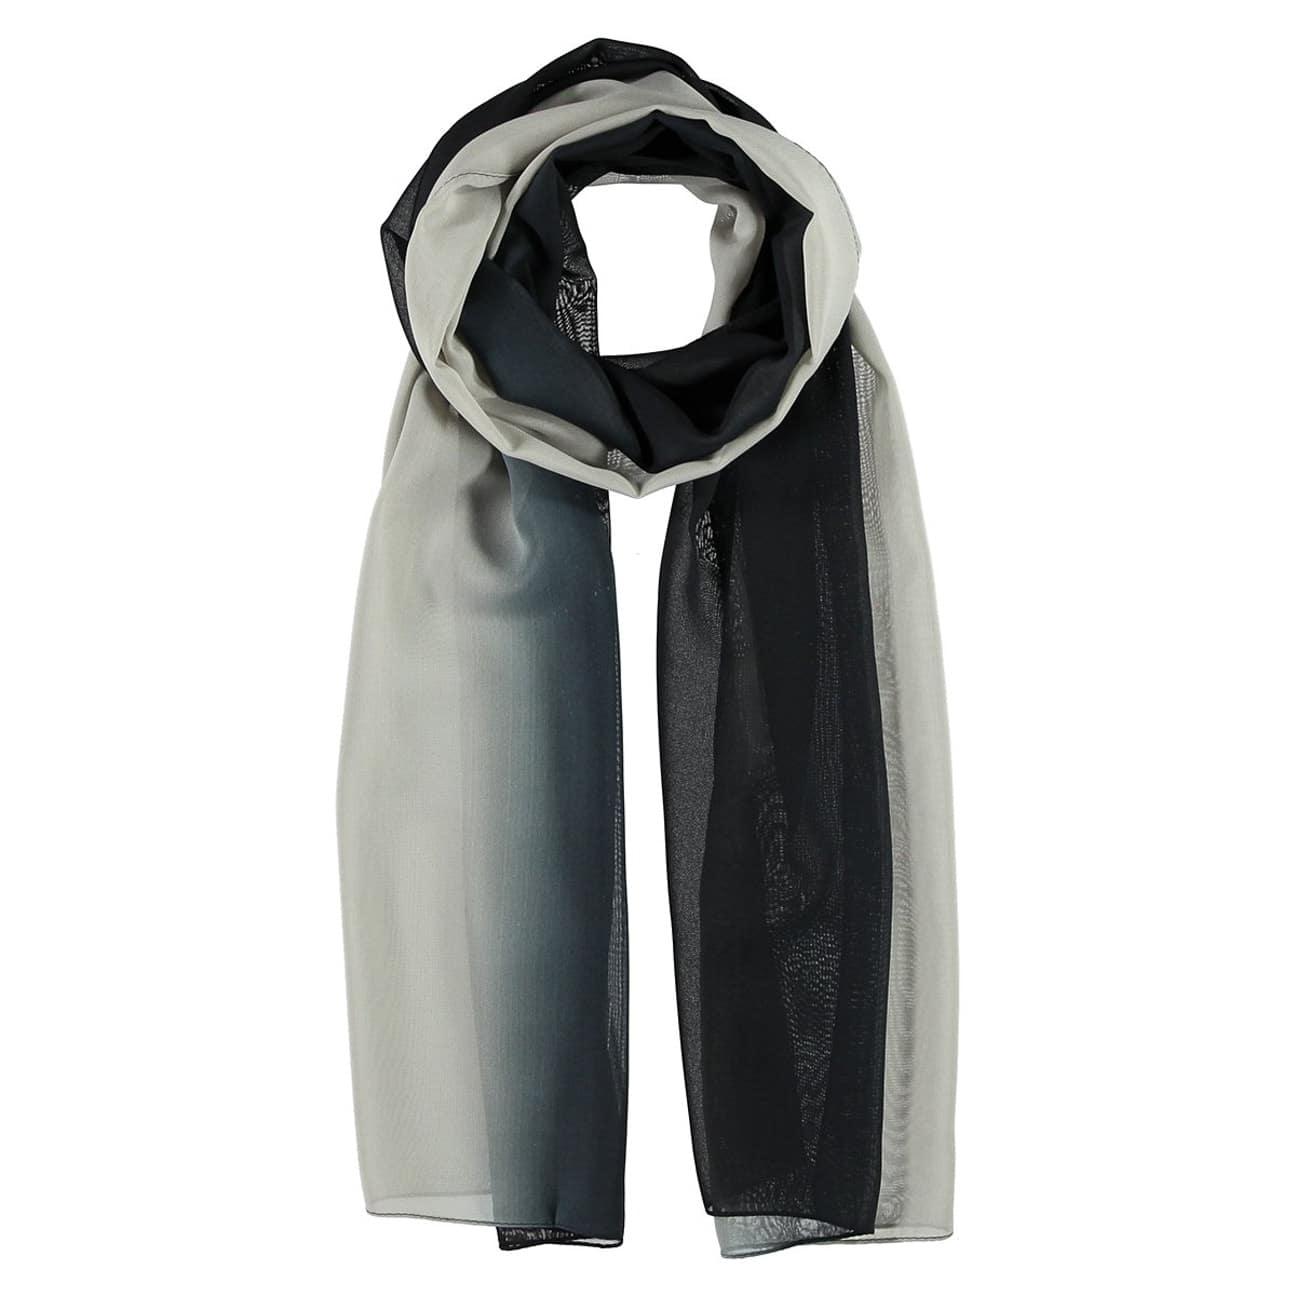 d0c798a5ba2886 ... Polyester Chiffon Scarf by Passigatti - black 1 ...